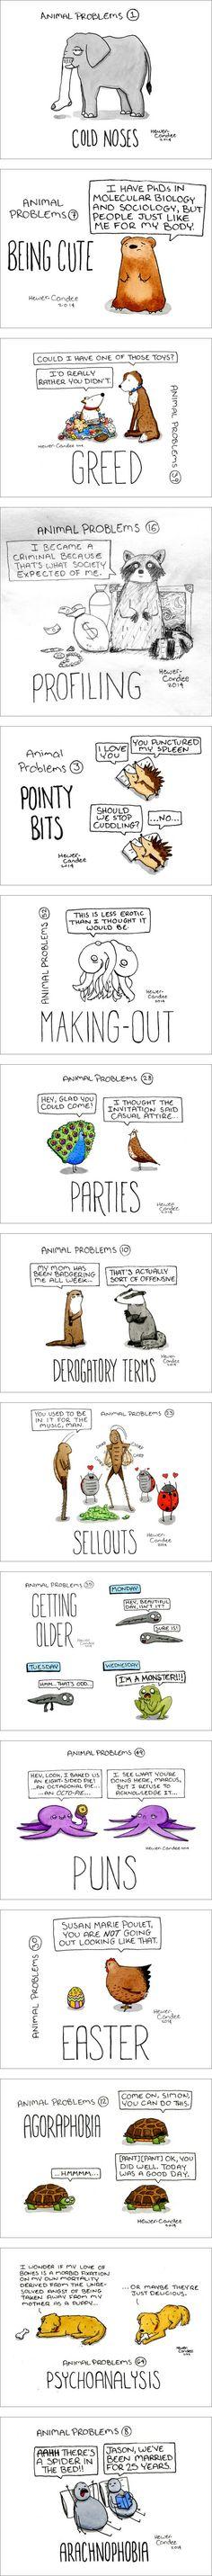 Animal Problems | love the psychoanalysis one